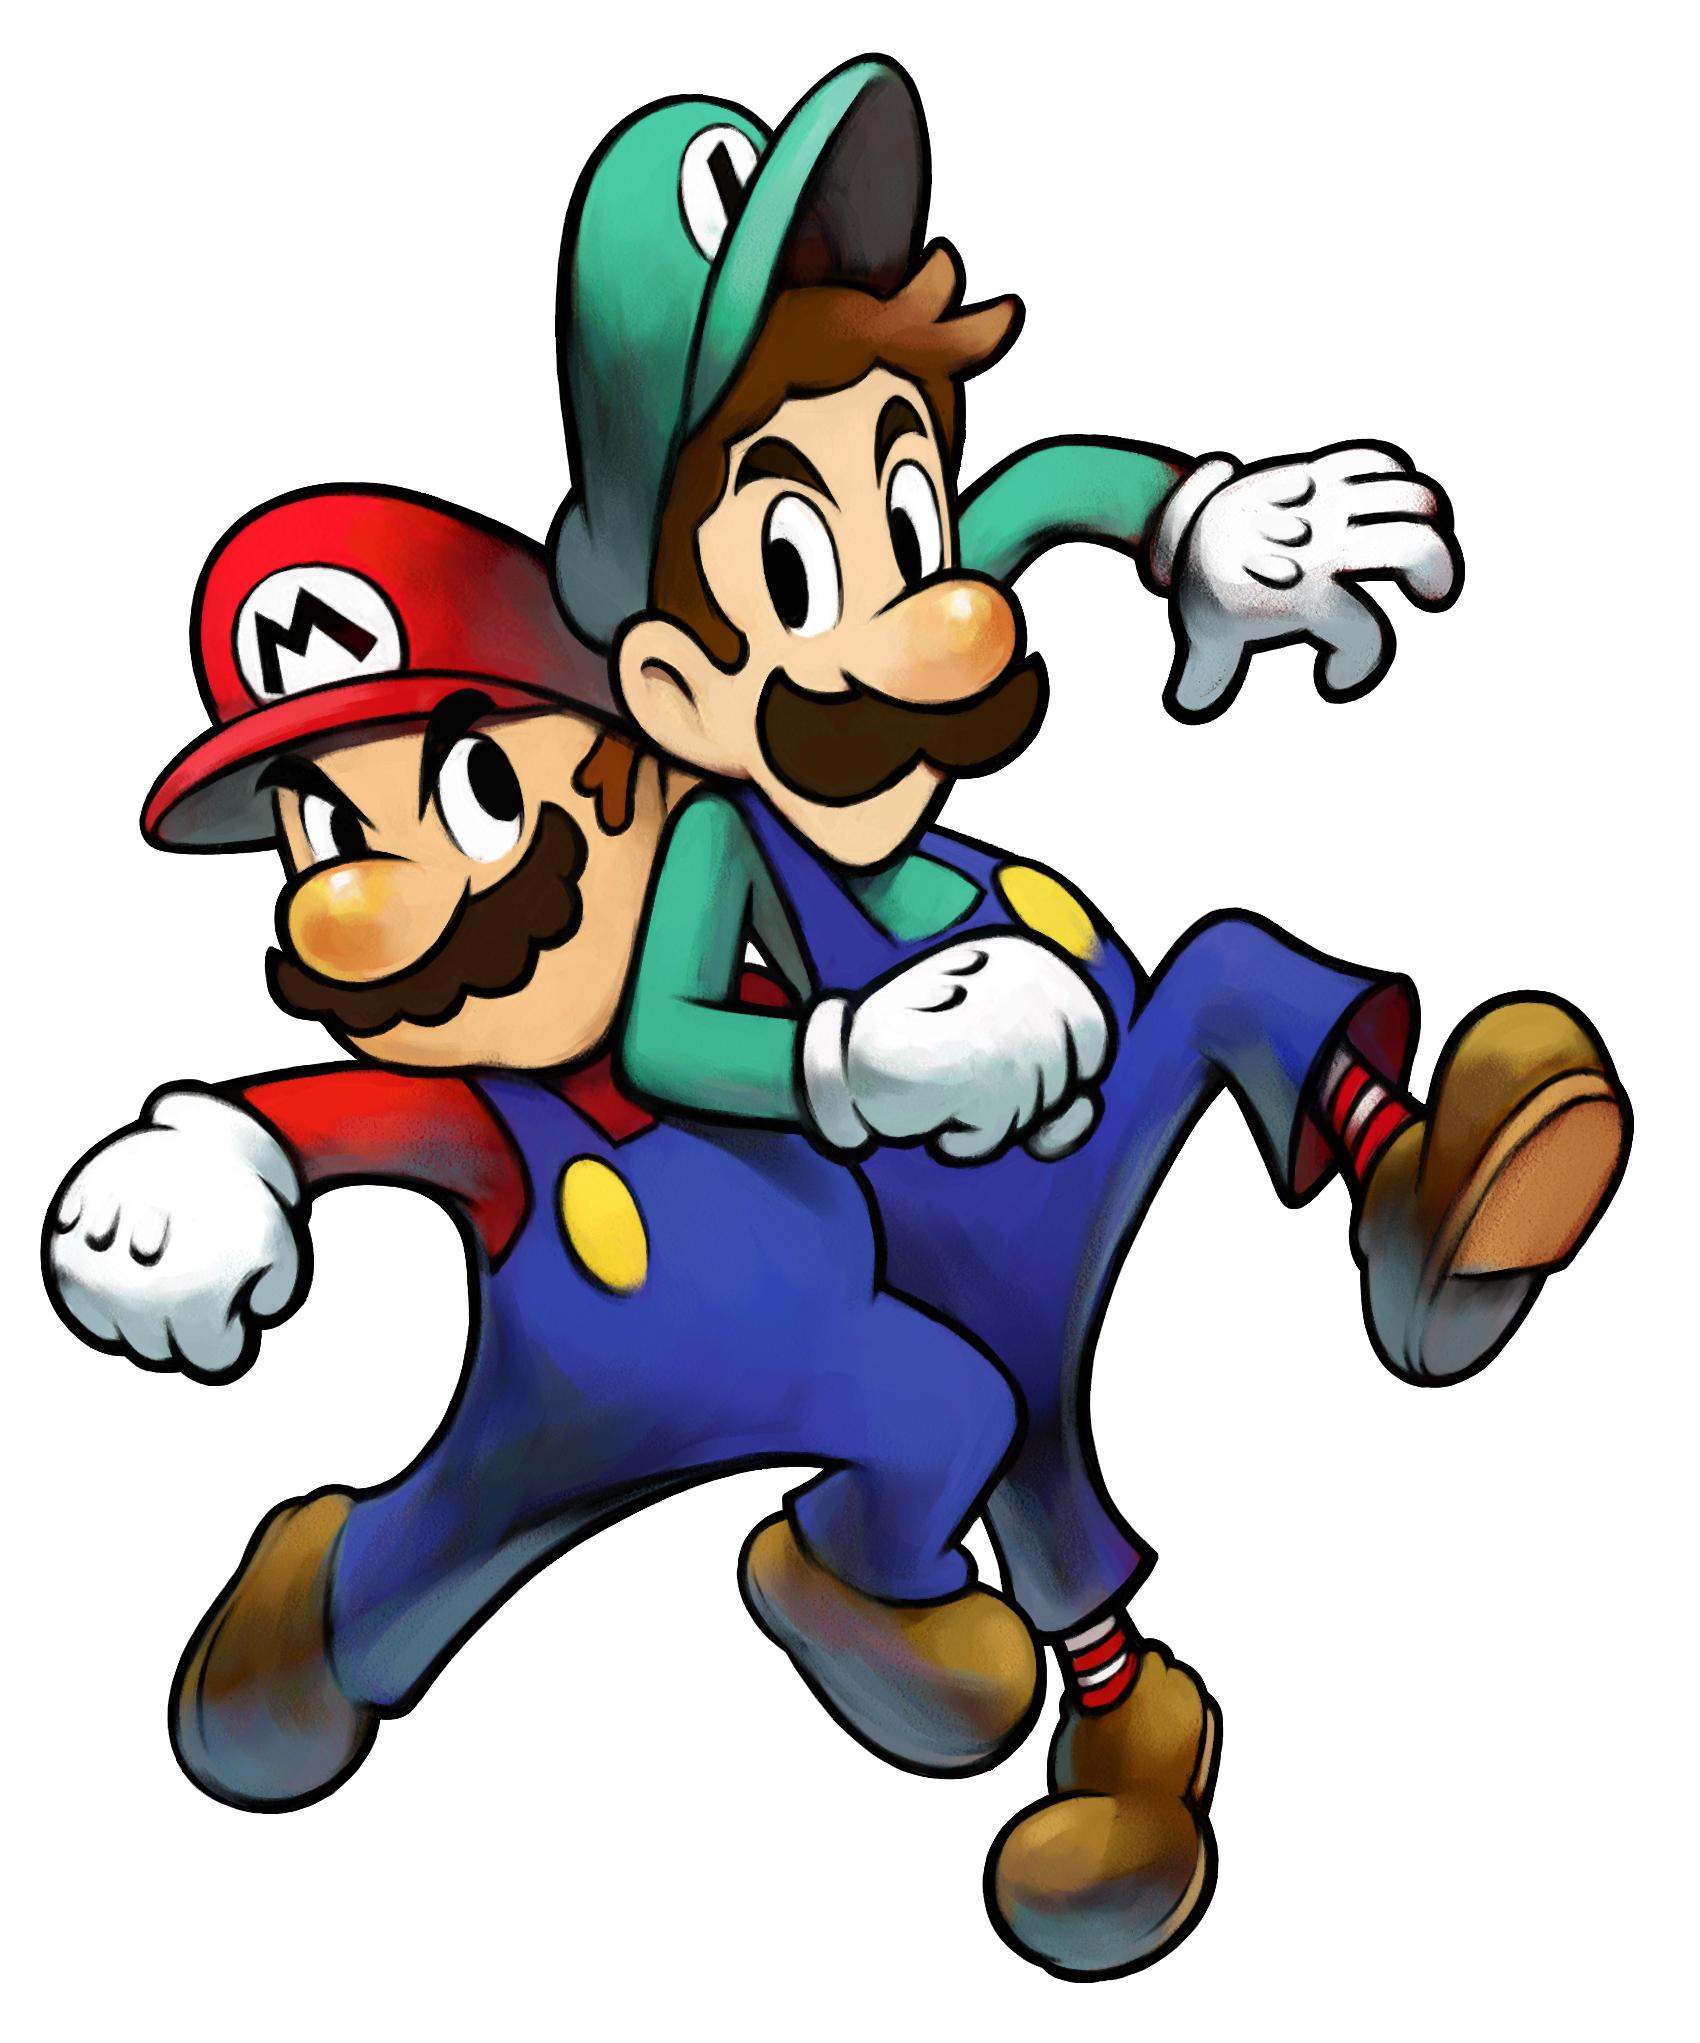 unbeatable duo mario and luigi db dokfanbattle wiki fandom